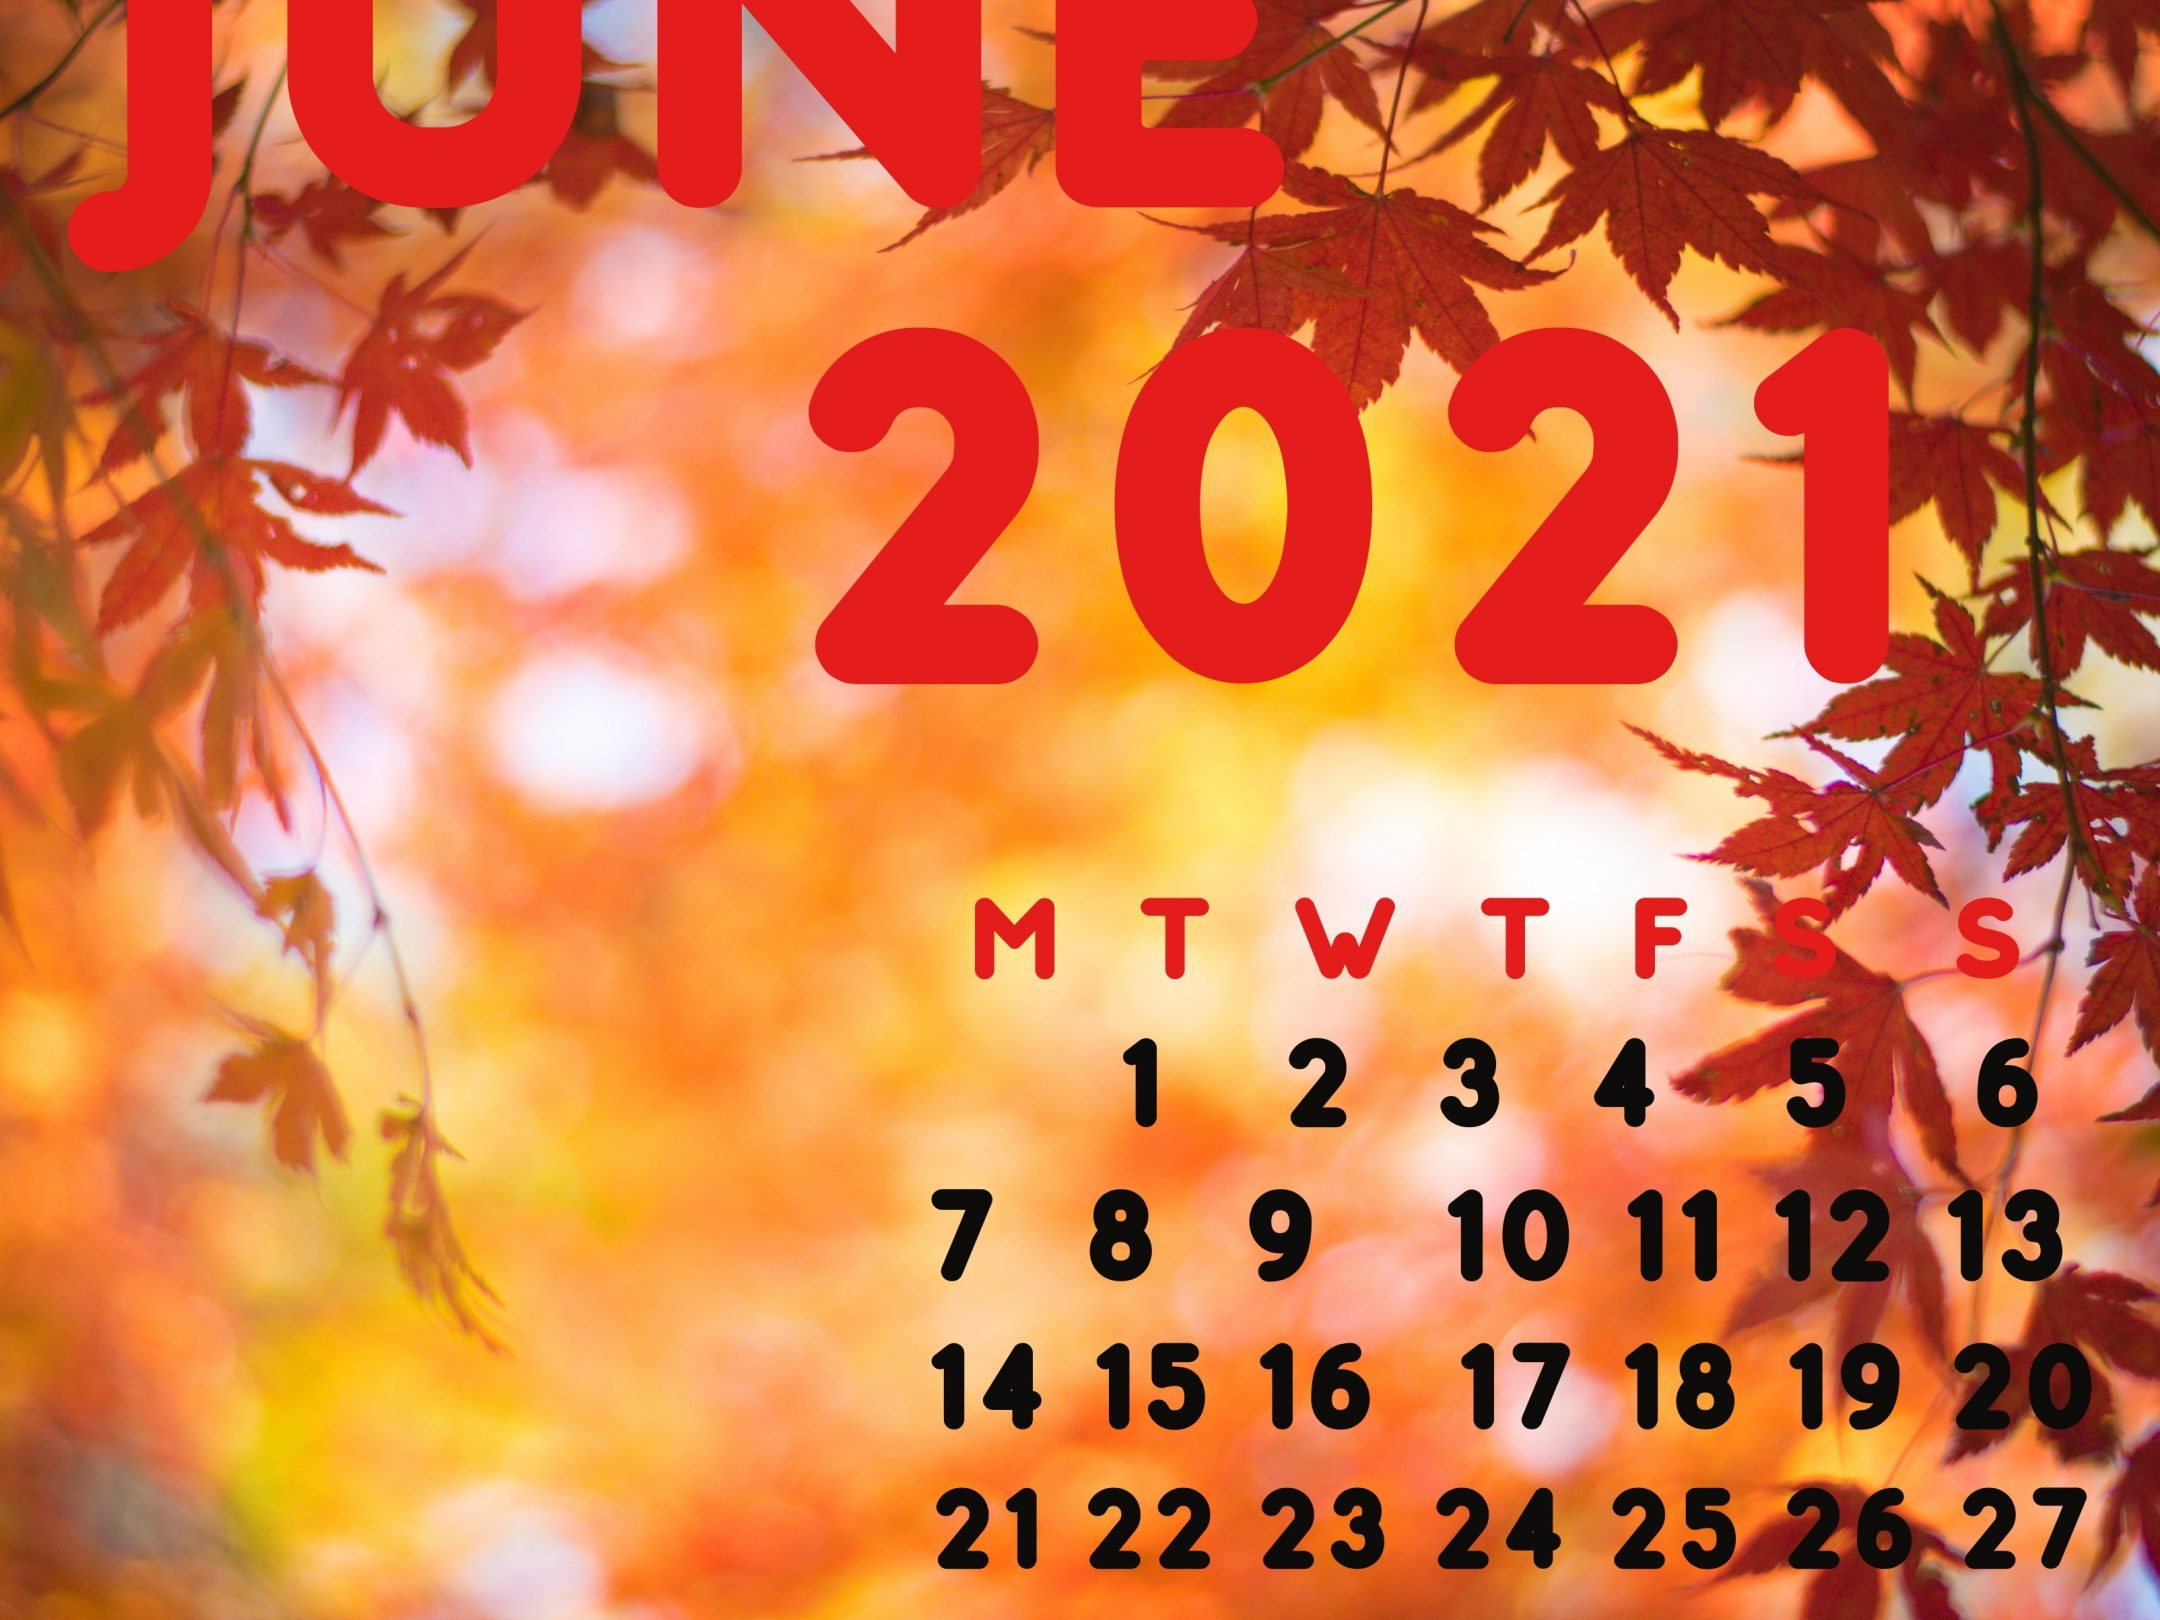 2160x1620 iPad wallpaper 4k June 2021 iPad Wallpaper 2160x1620 pixels resolution